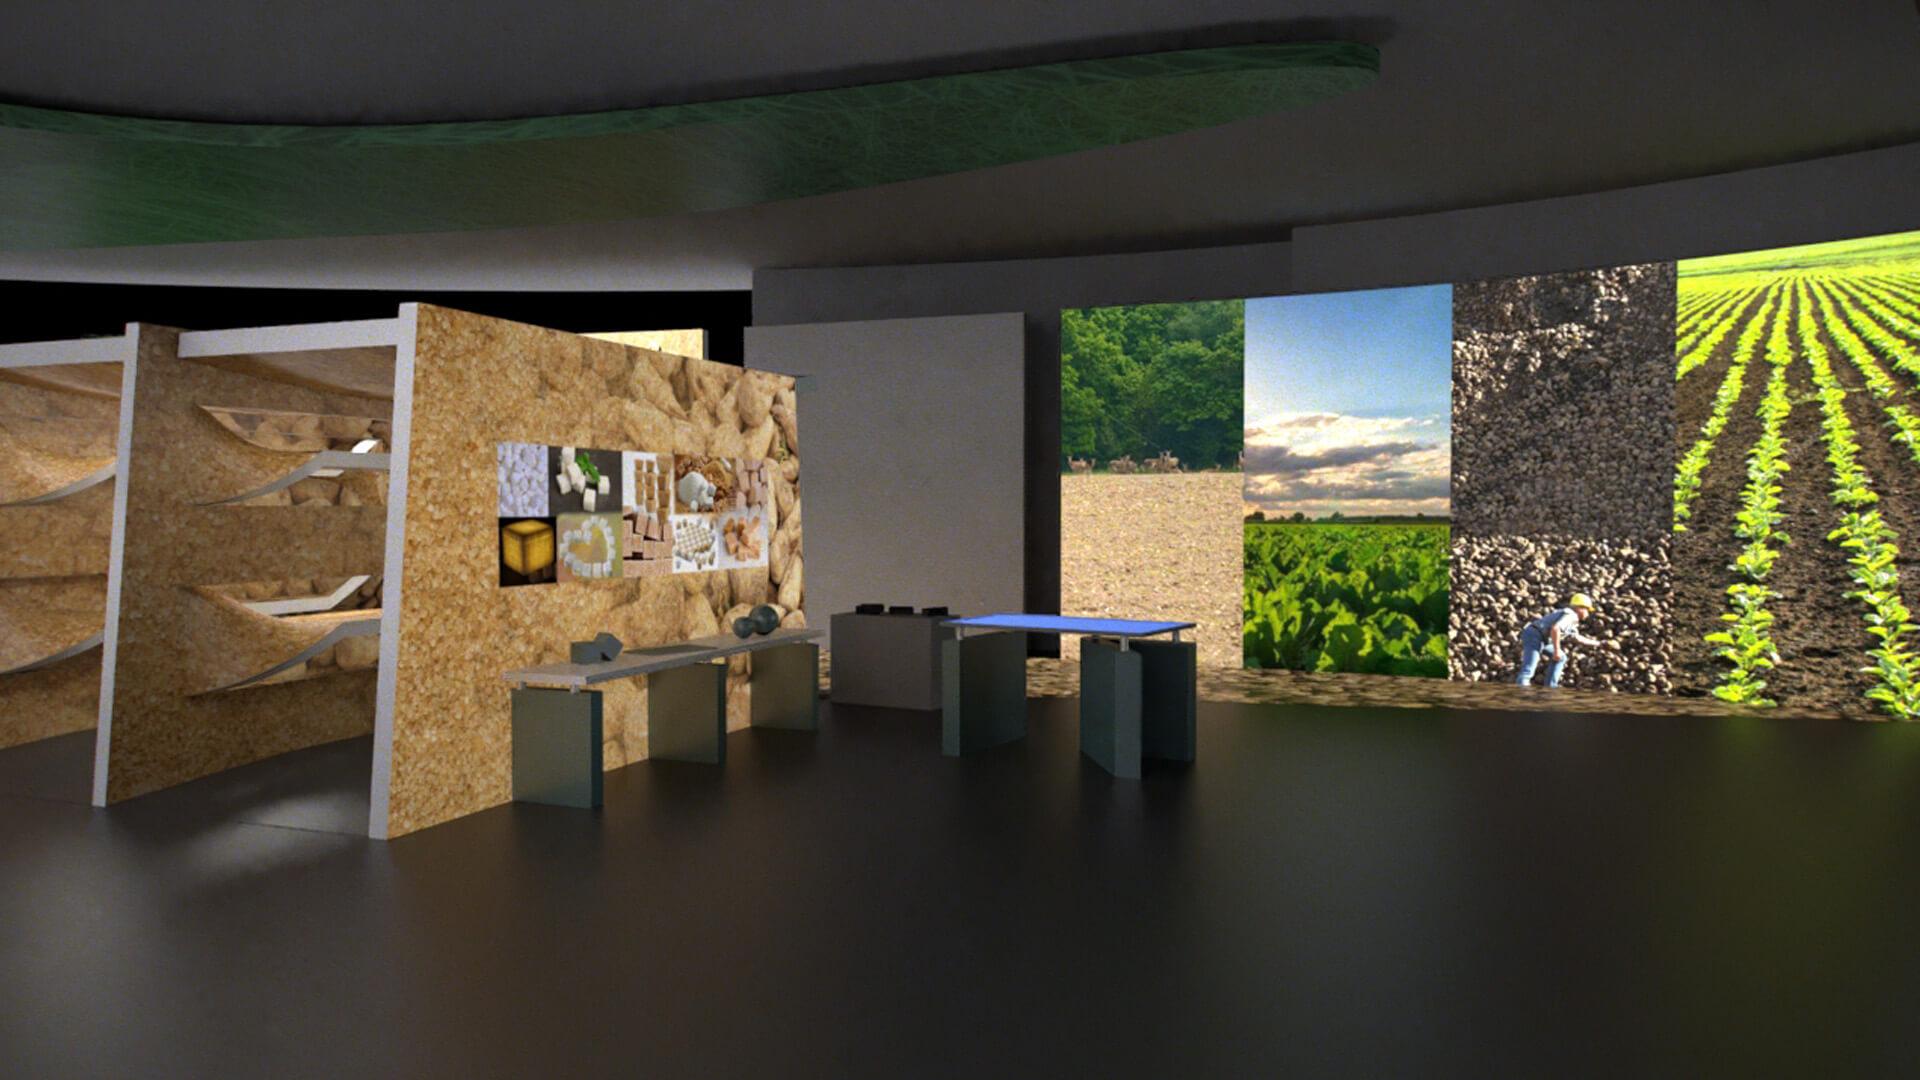 Exhibition-Concept-Foodworld-Bayern-Sued_02